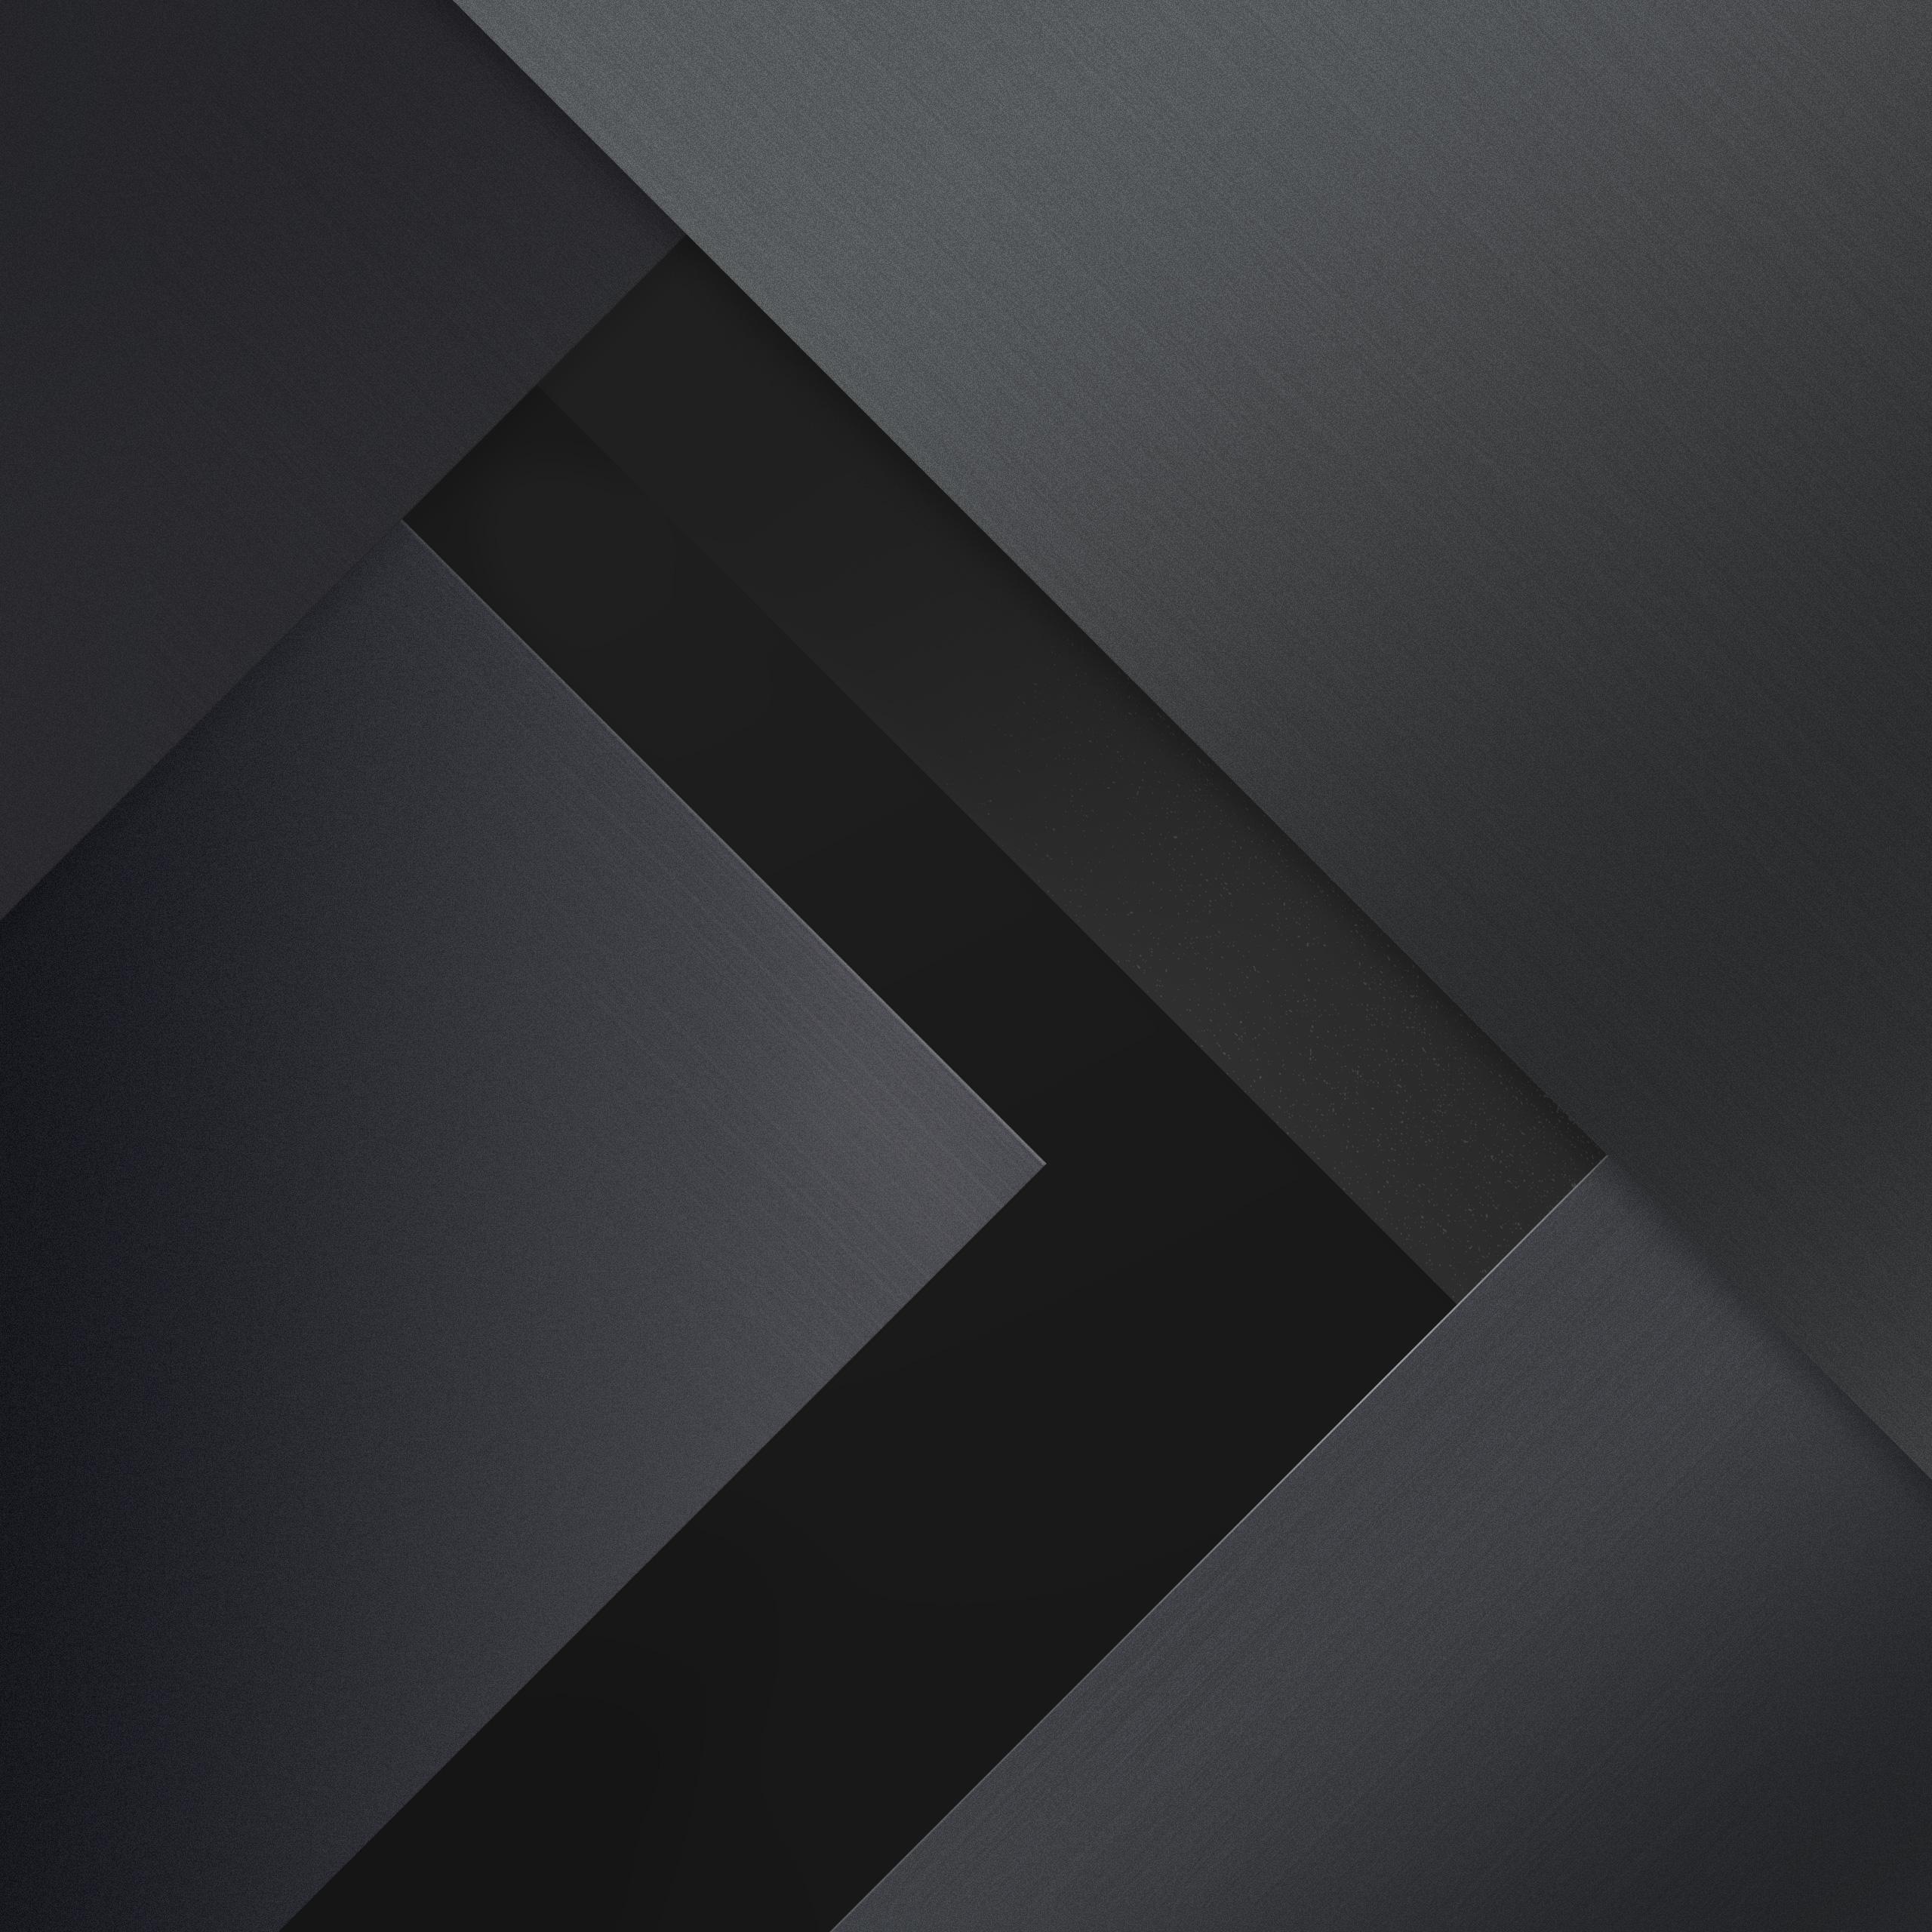 Samsung Galaxy S7 and Galaxy S7 edge wallpapers leak   SamMobile 2560x2560